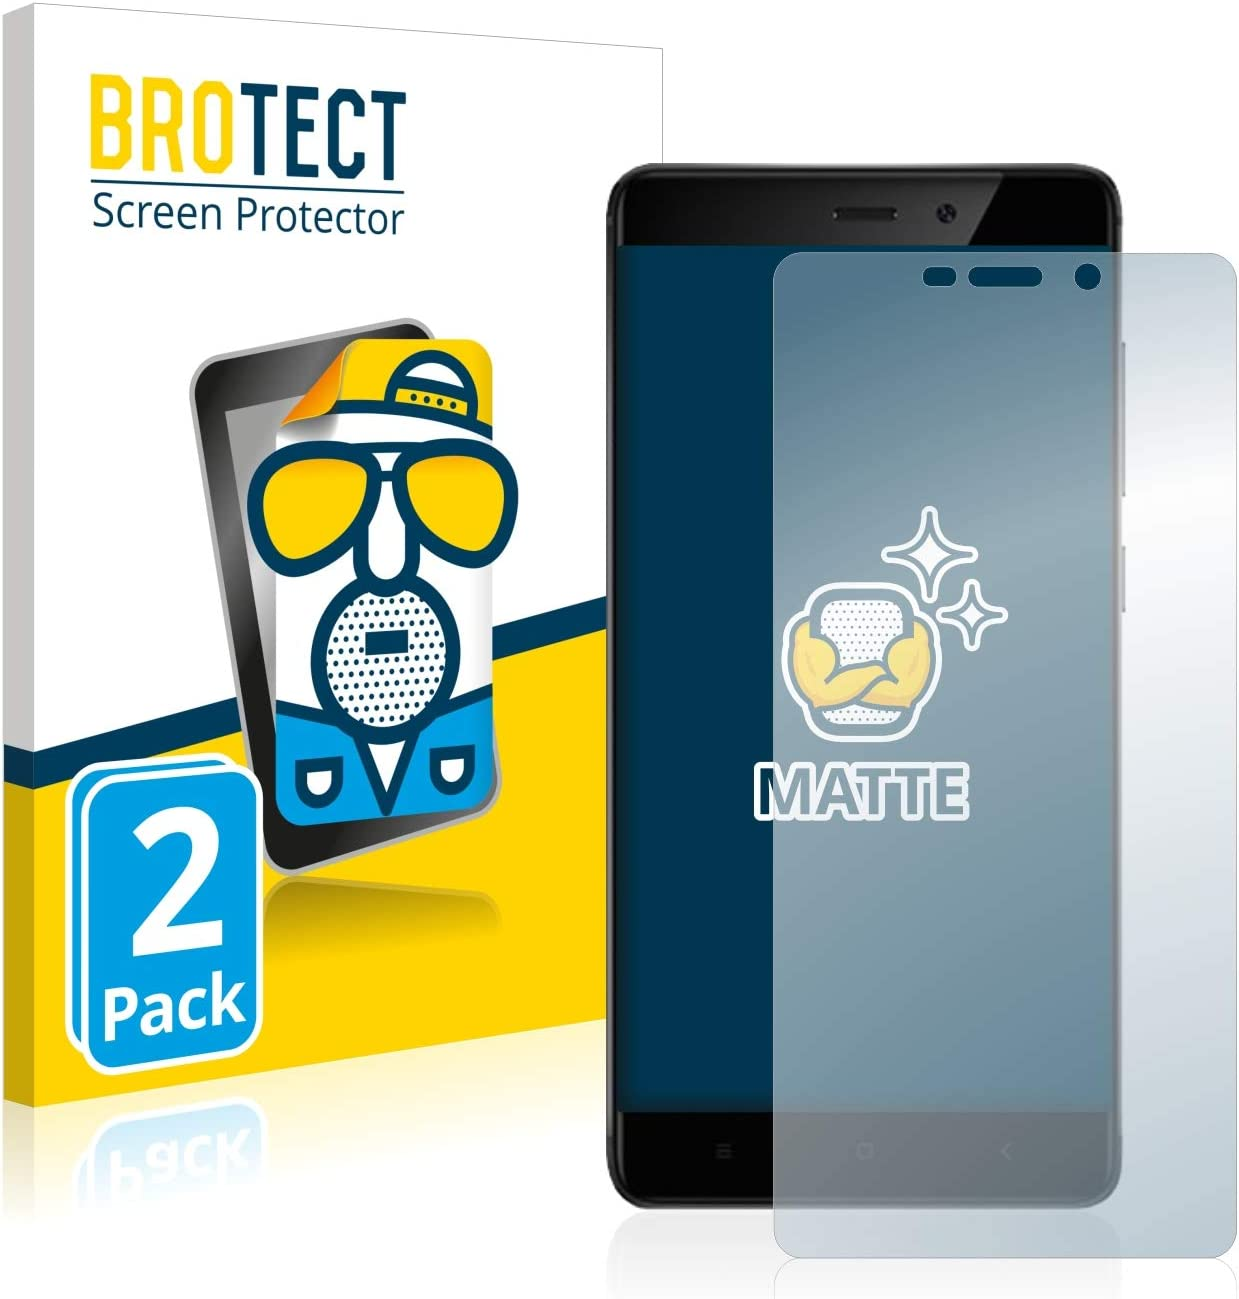 BROTECT Protector Pantalla Anti-Reflejos Compatible con Xiaomi Redmi 4 Pro (2 Unidades) Pelicula Mate Anti-Huellas